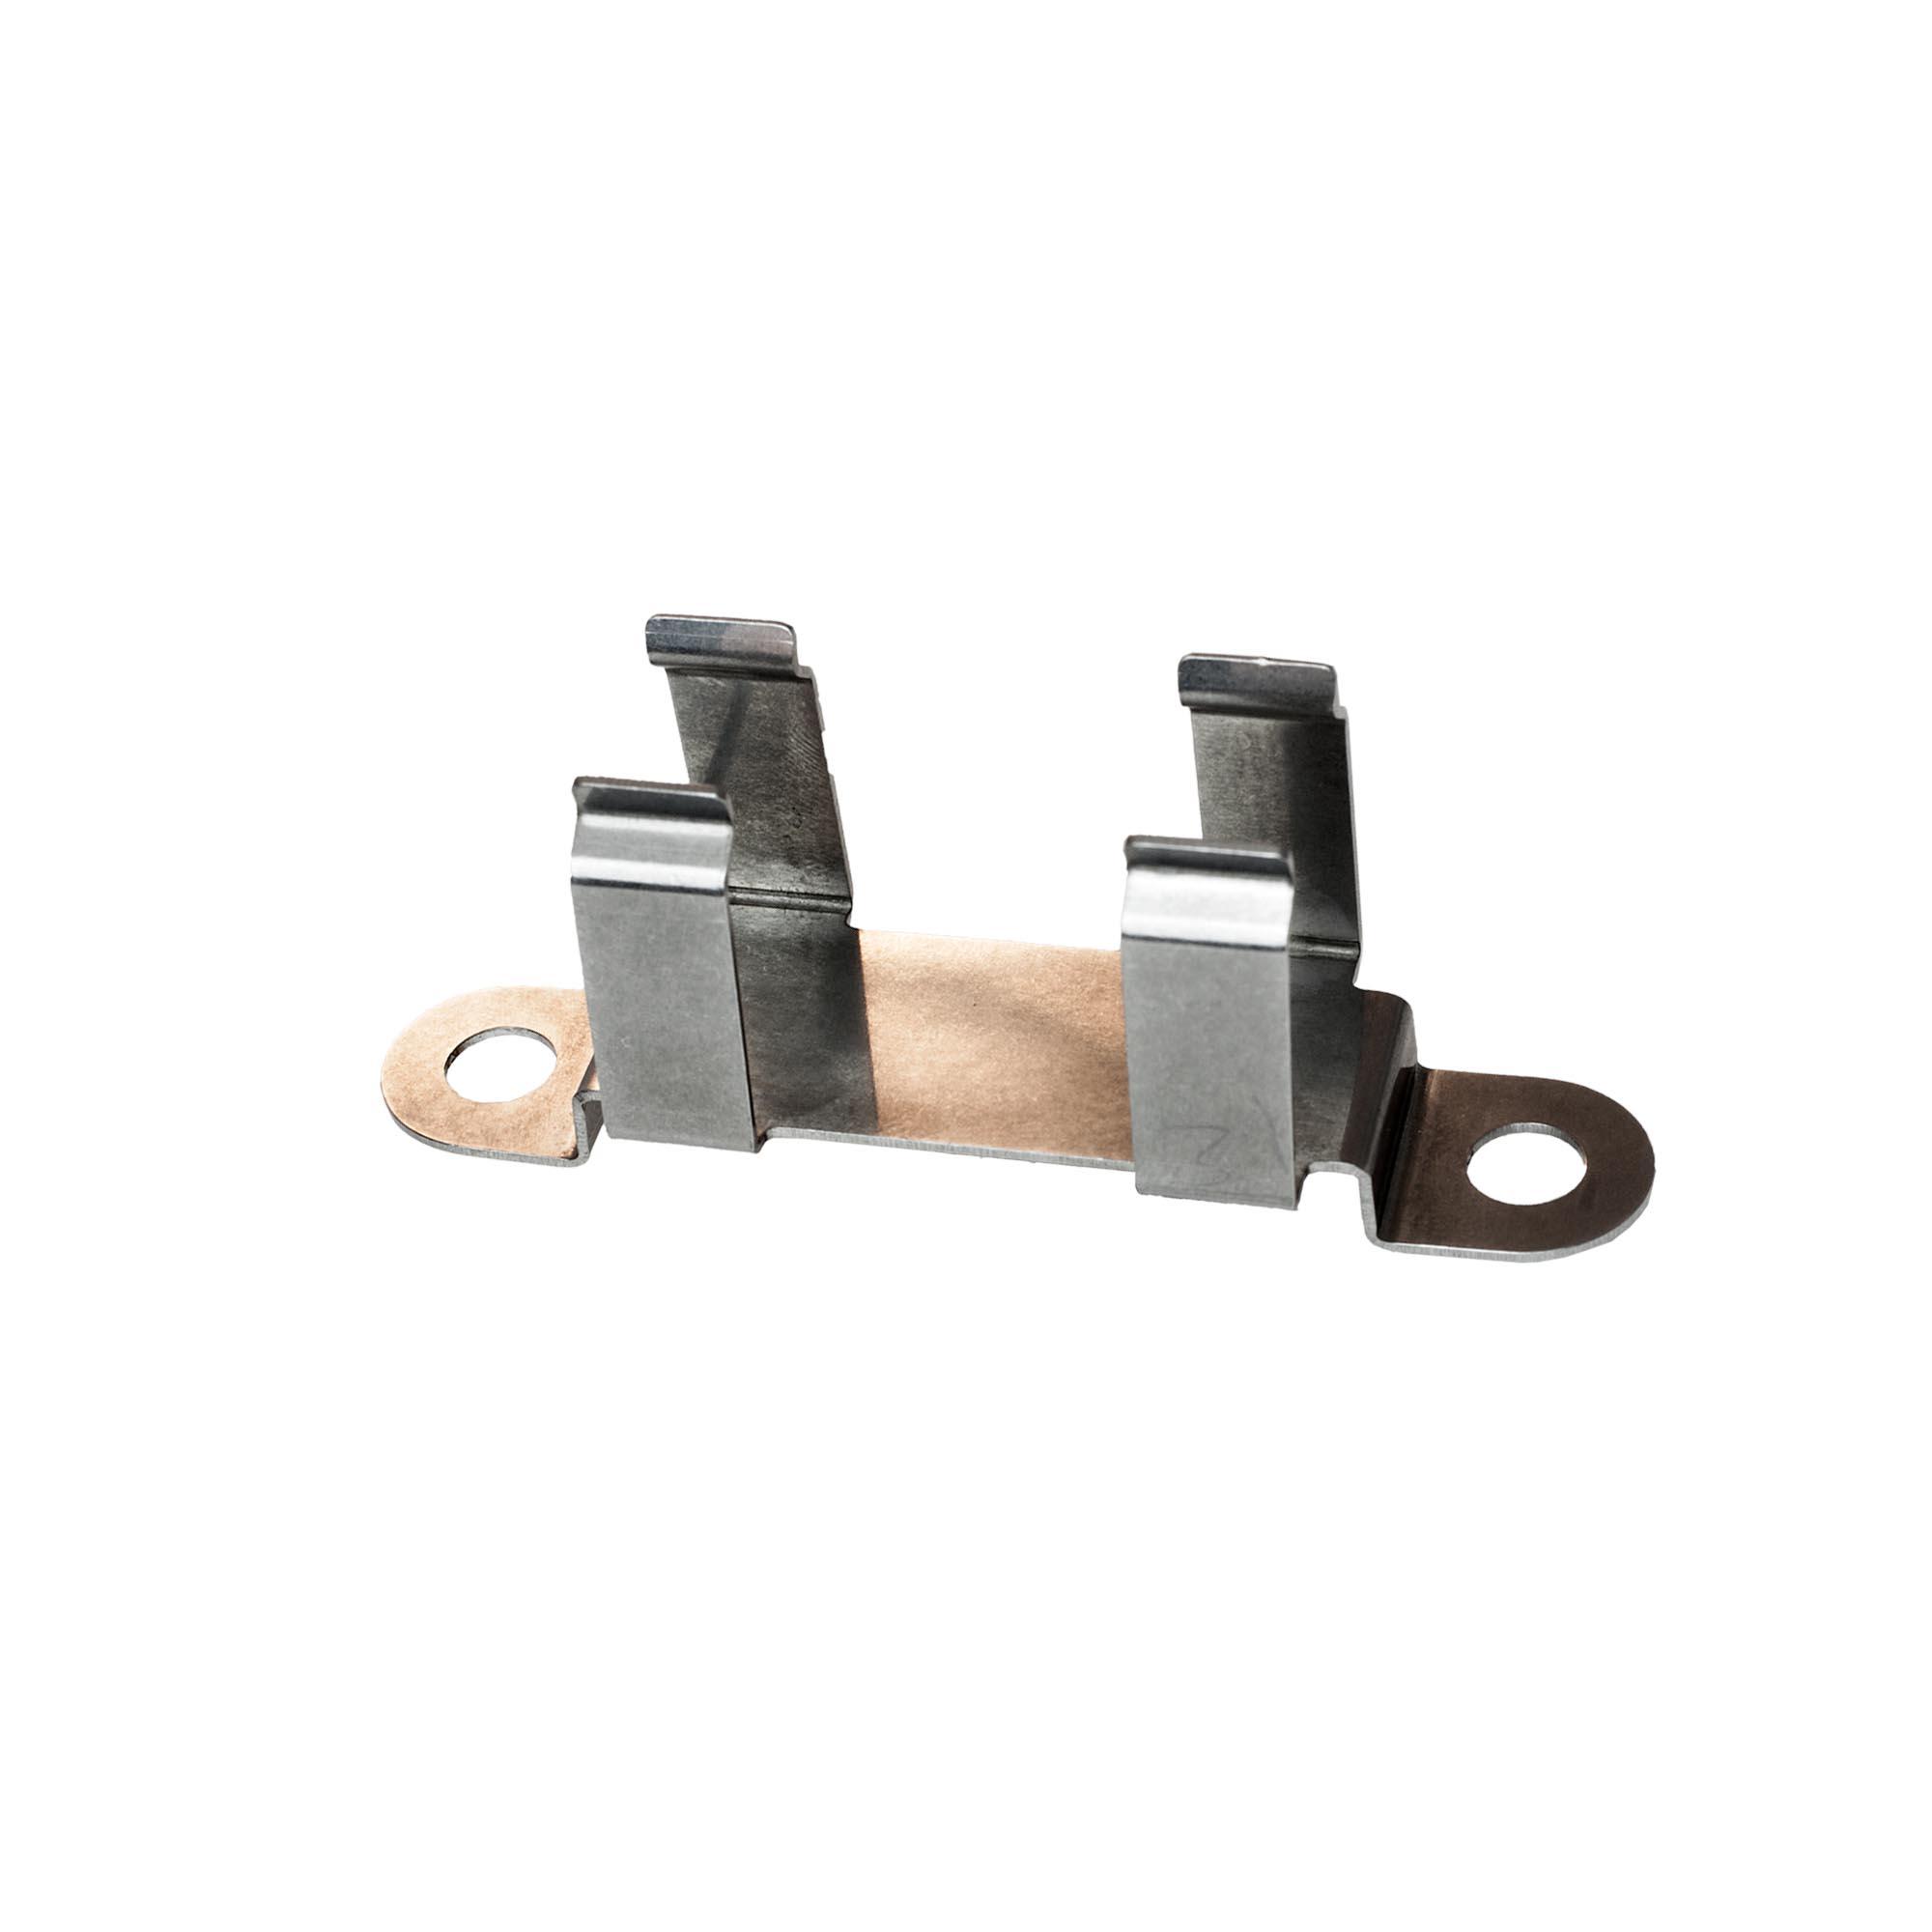 Model 901556 Mounting Bracket for 1/2 NPT Liquid Atomizing Nozzles.